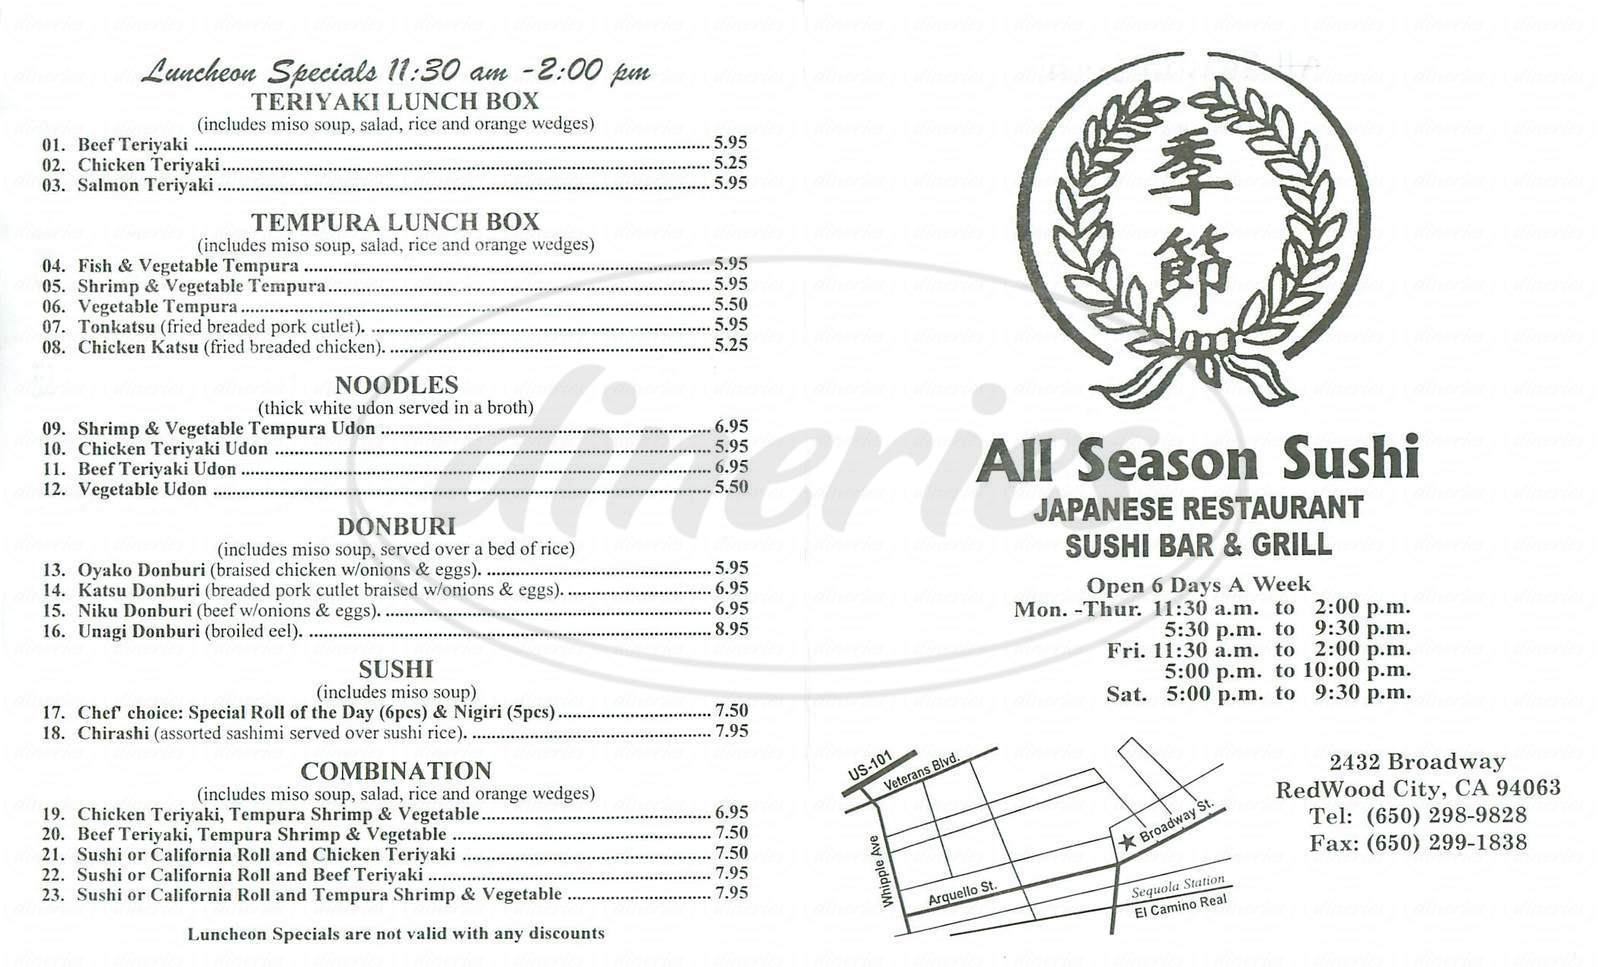 Big menu for All Season Sushi, Redwood City